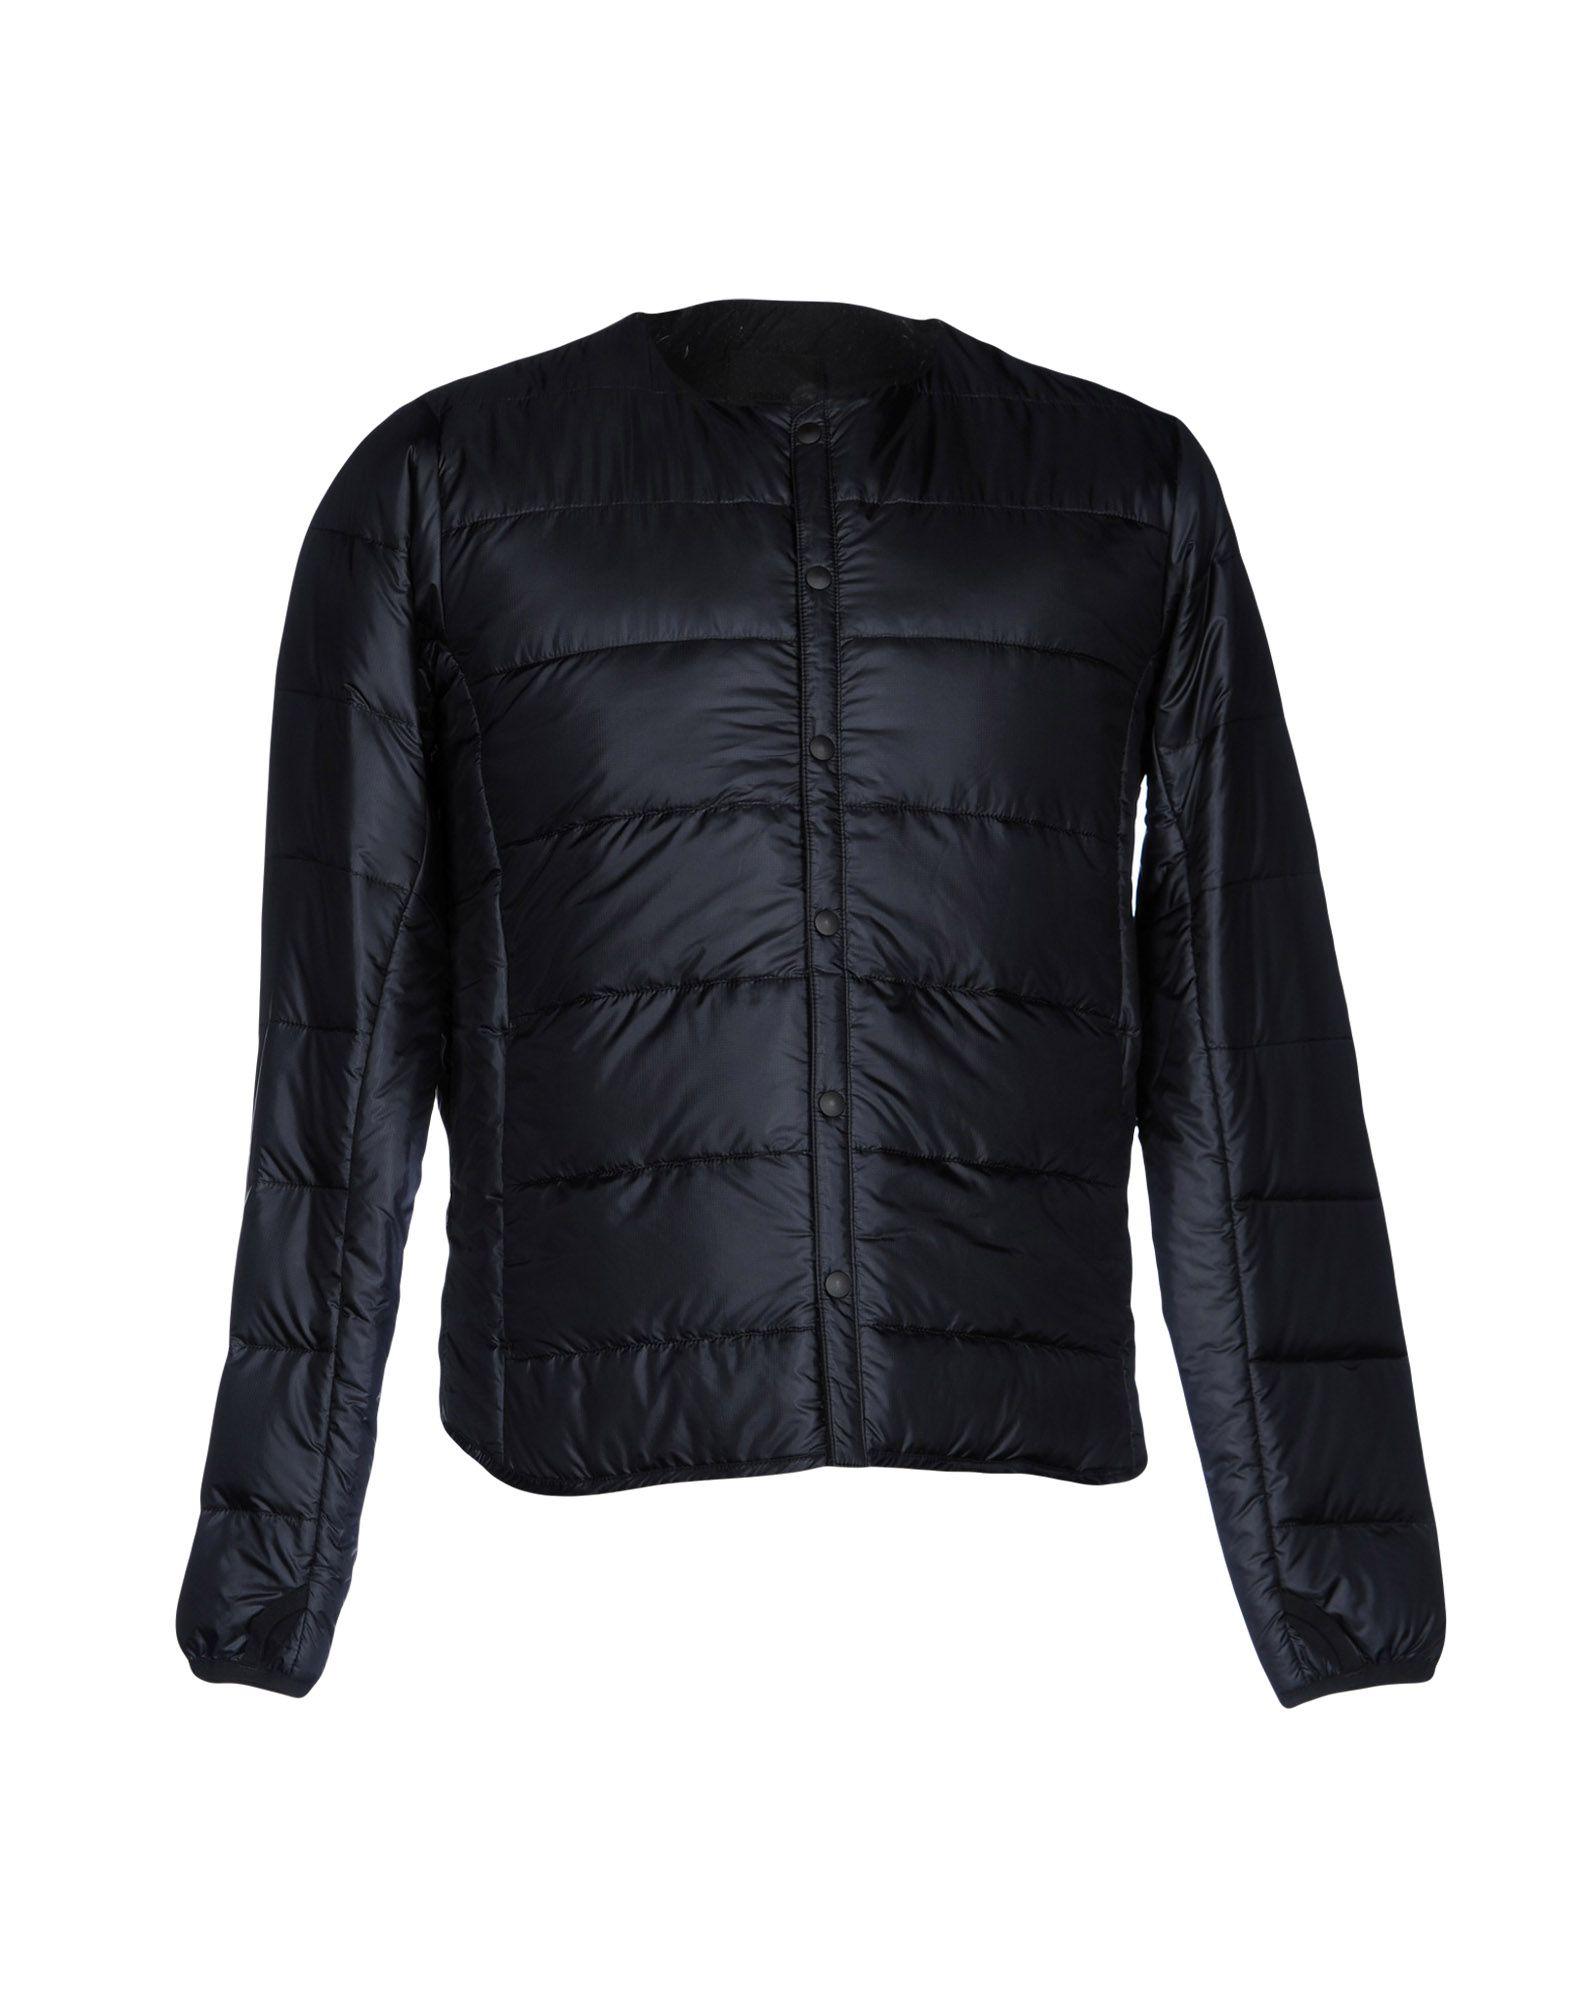 DESCENTE Down Jackets in Black